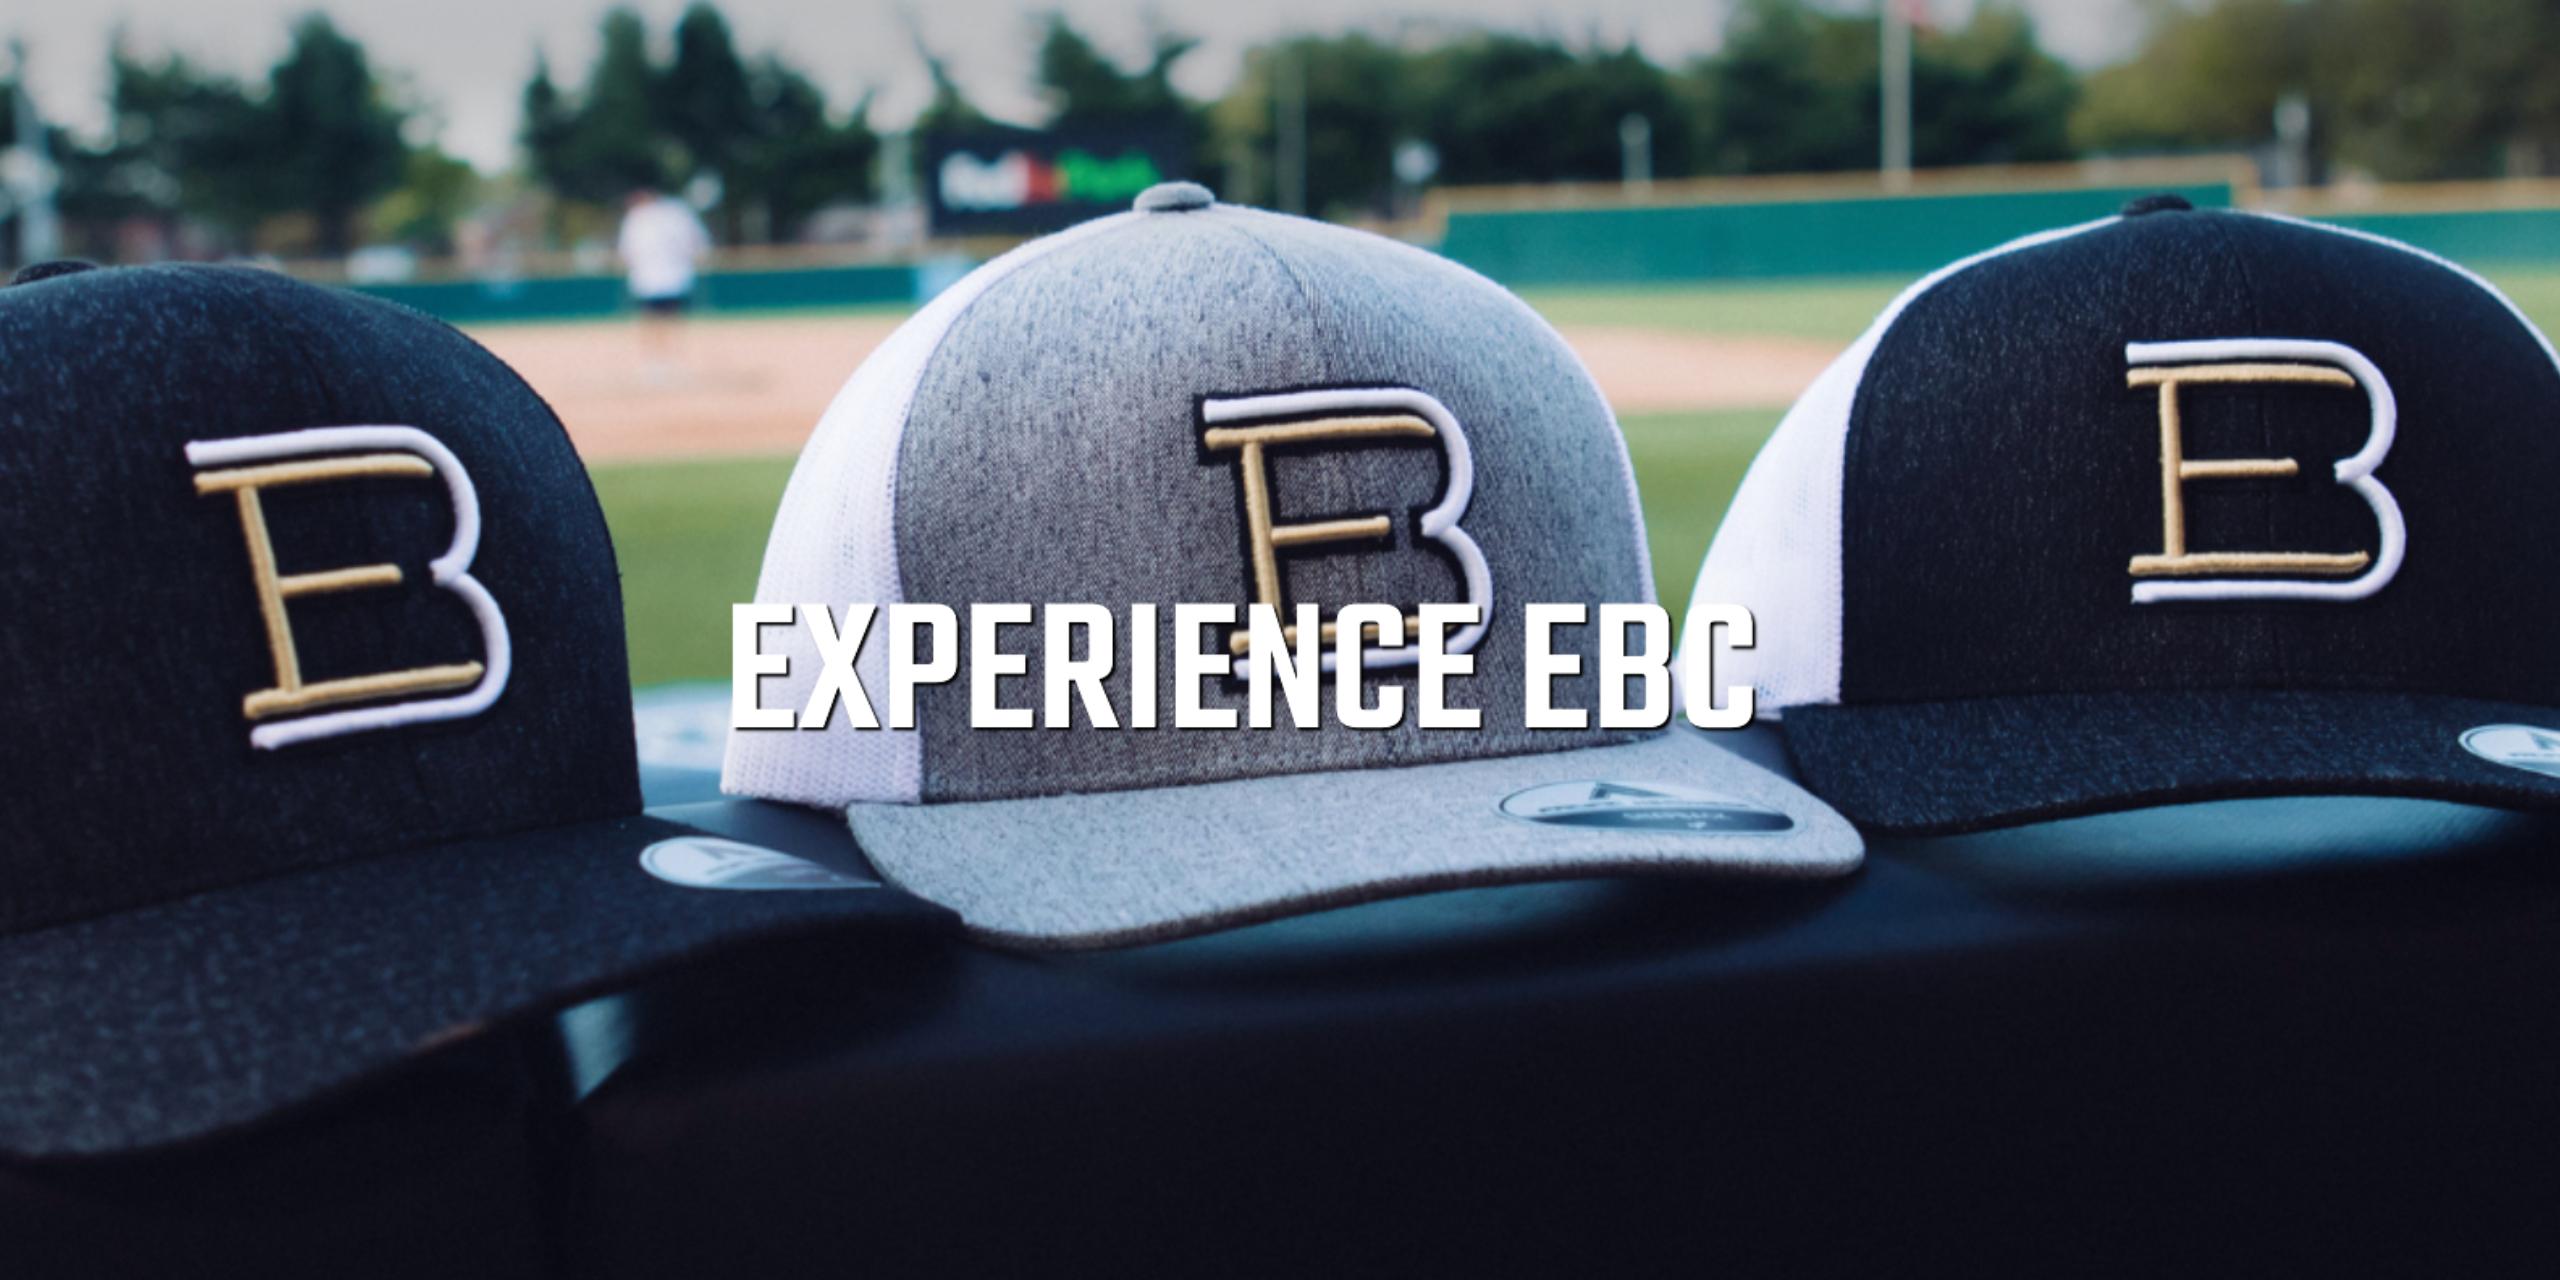 Easley baseball club travel baseball